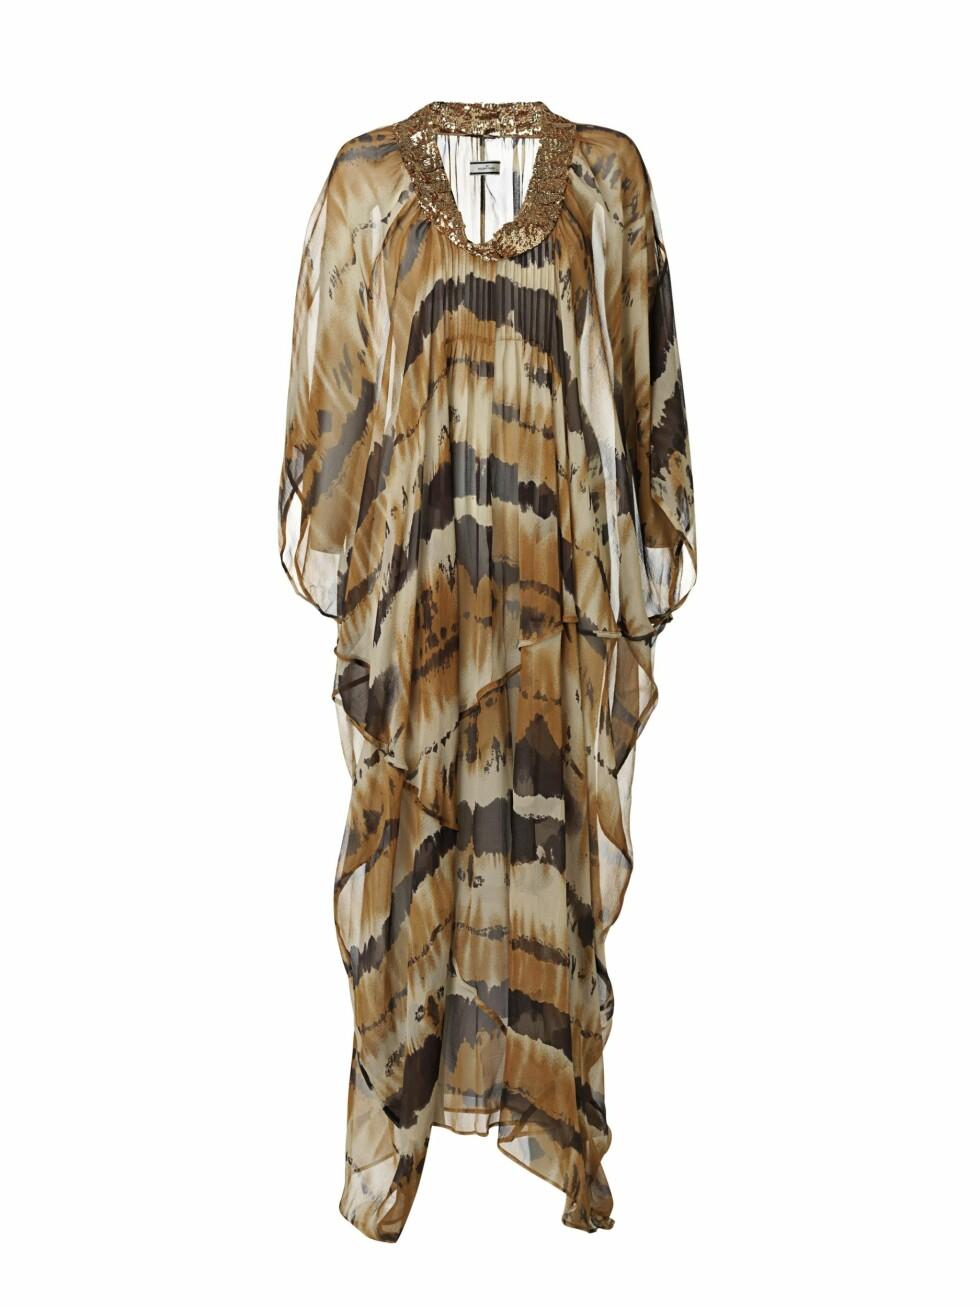 Lang kaftan/kjole (Hoobs) - 20% - 3699 kroner.  Foto: Produsenten